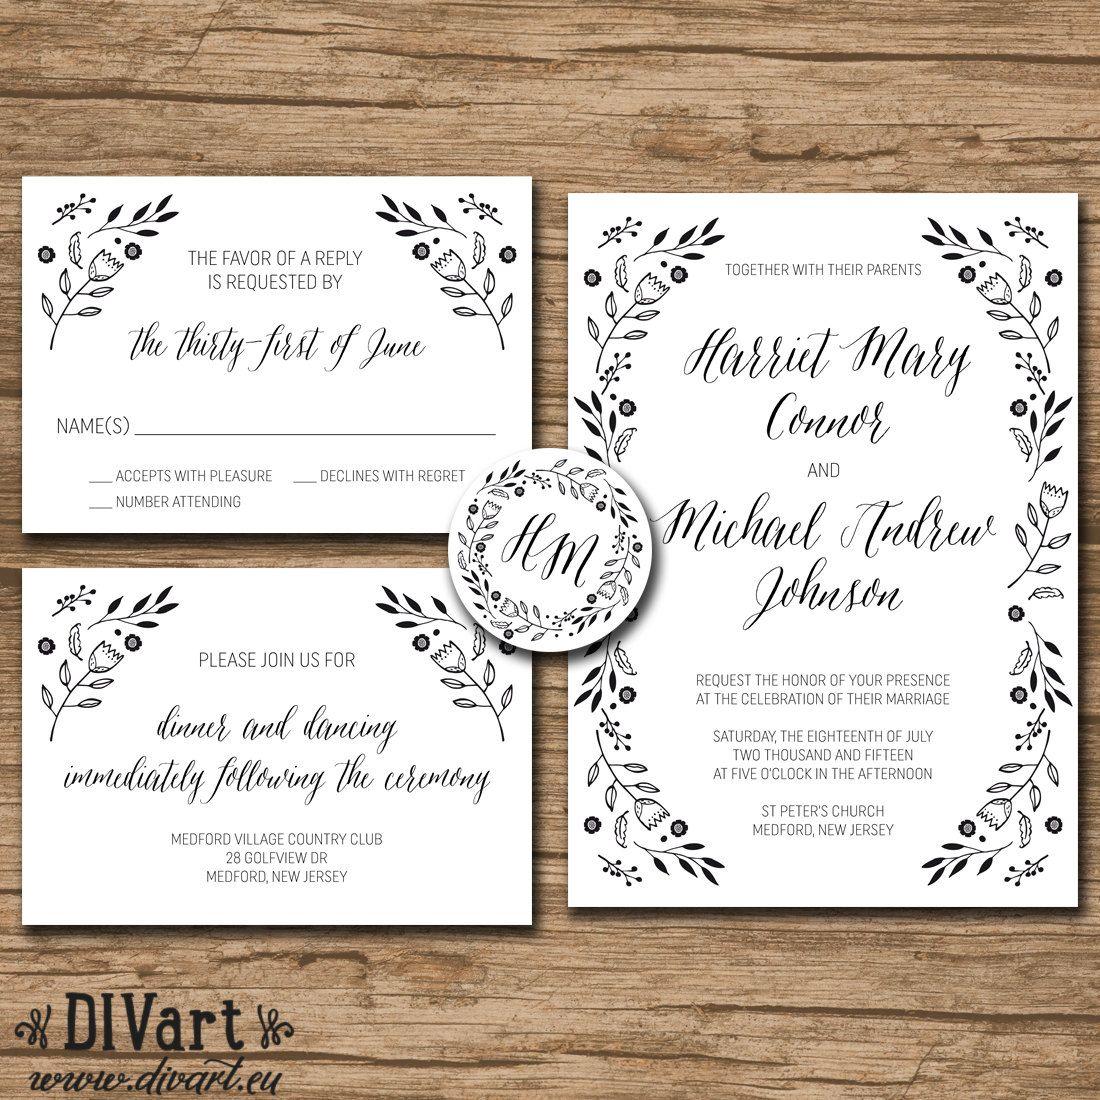 Rustic Wedding Invitation Suite, Response Card, Monogram - PRINTABLE files - garden wedding, rustic wedding, kraft paper, flowers - Harriet by DIVart on Etsy